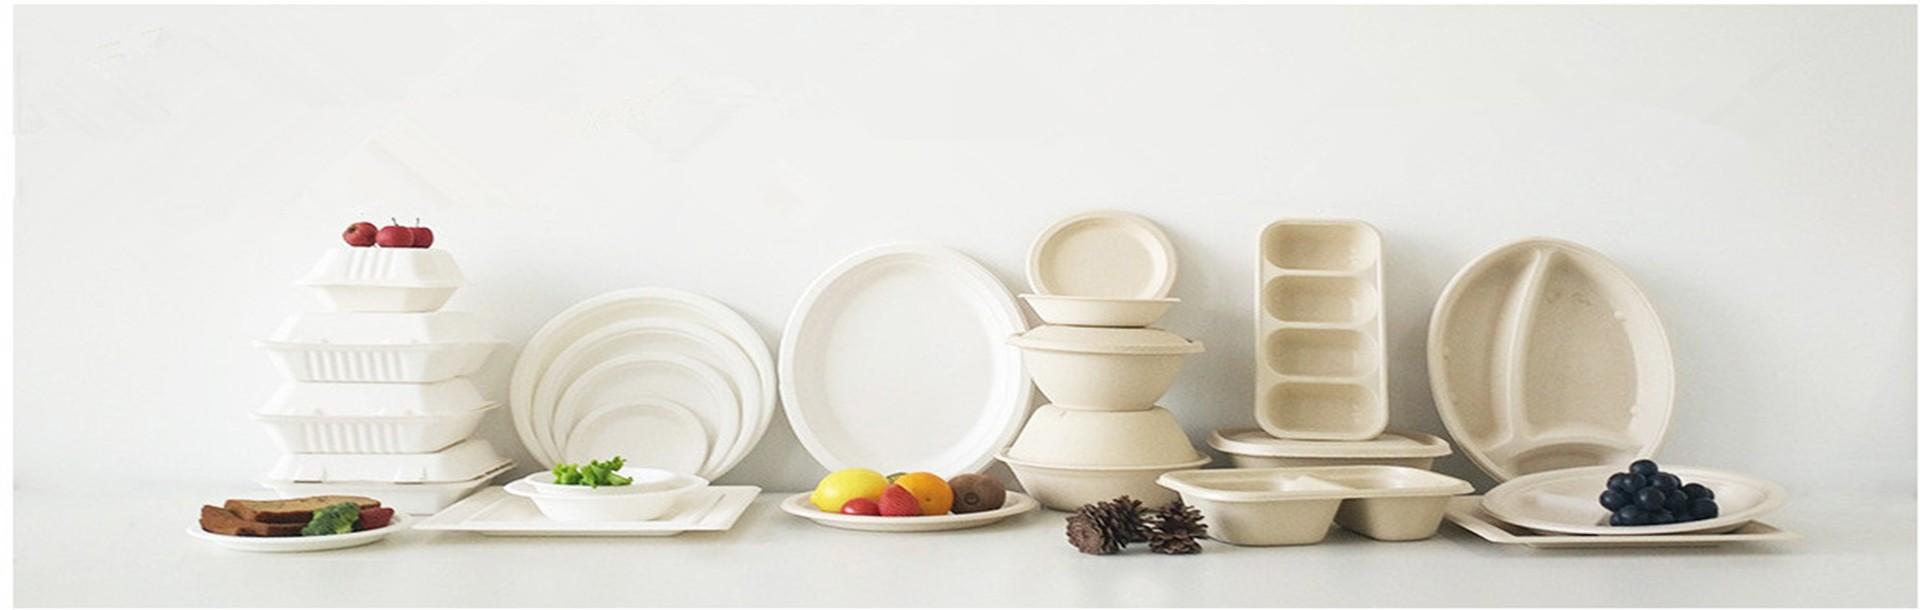 биоразлагаемые посуда